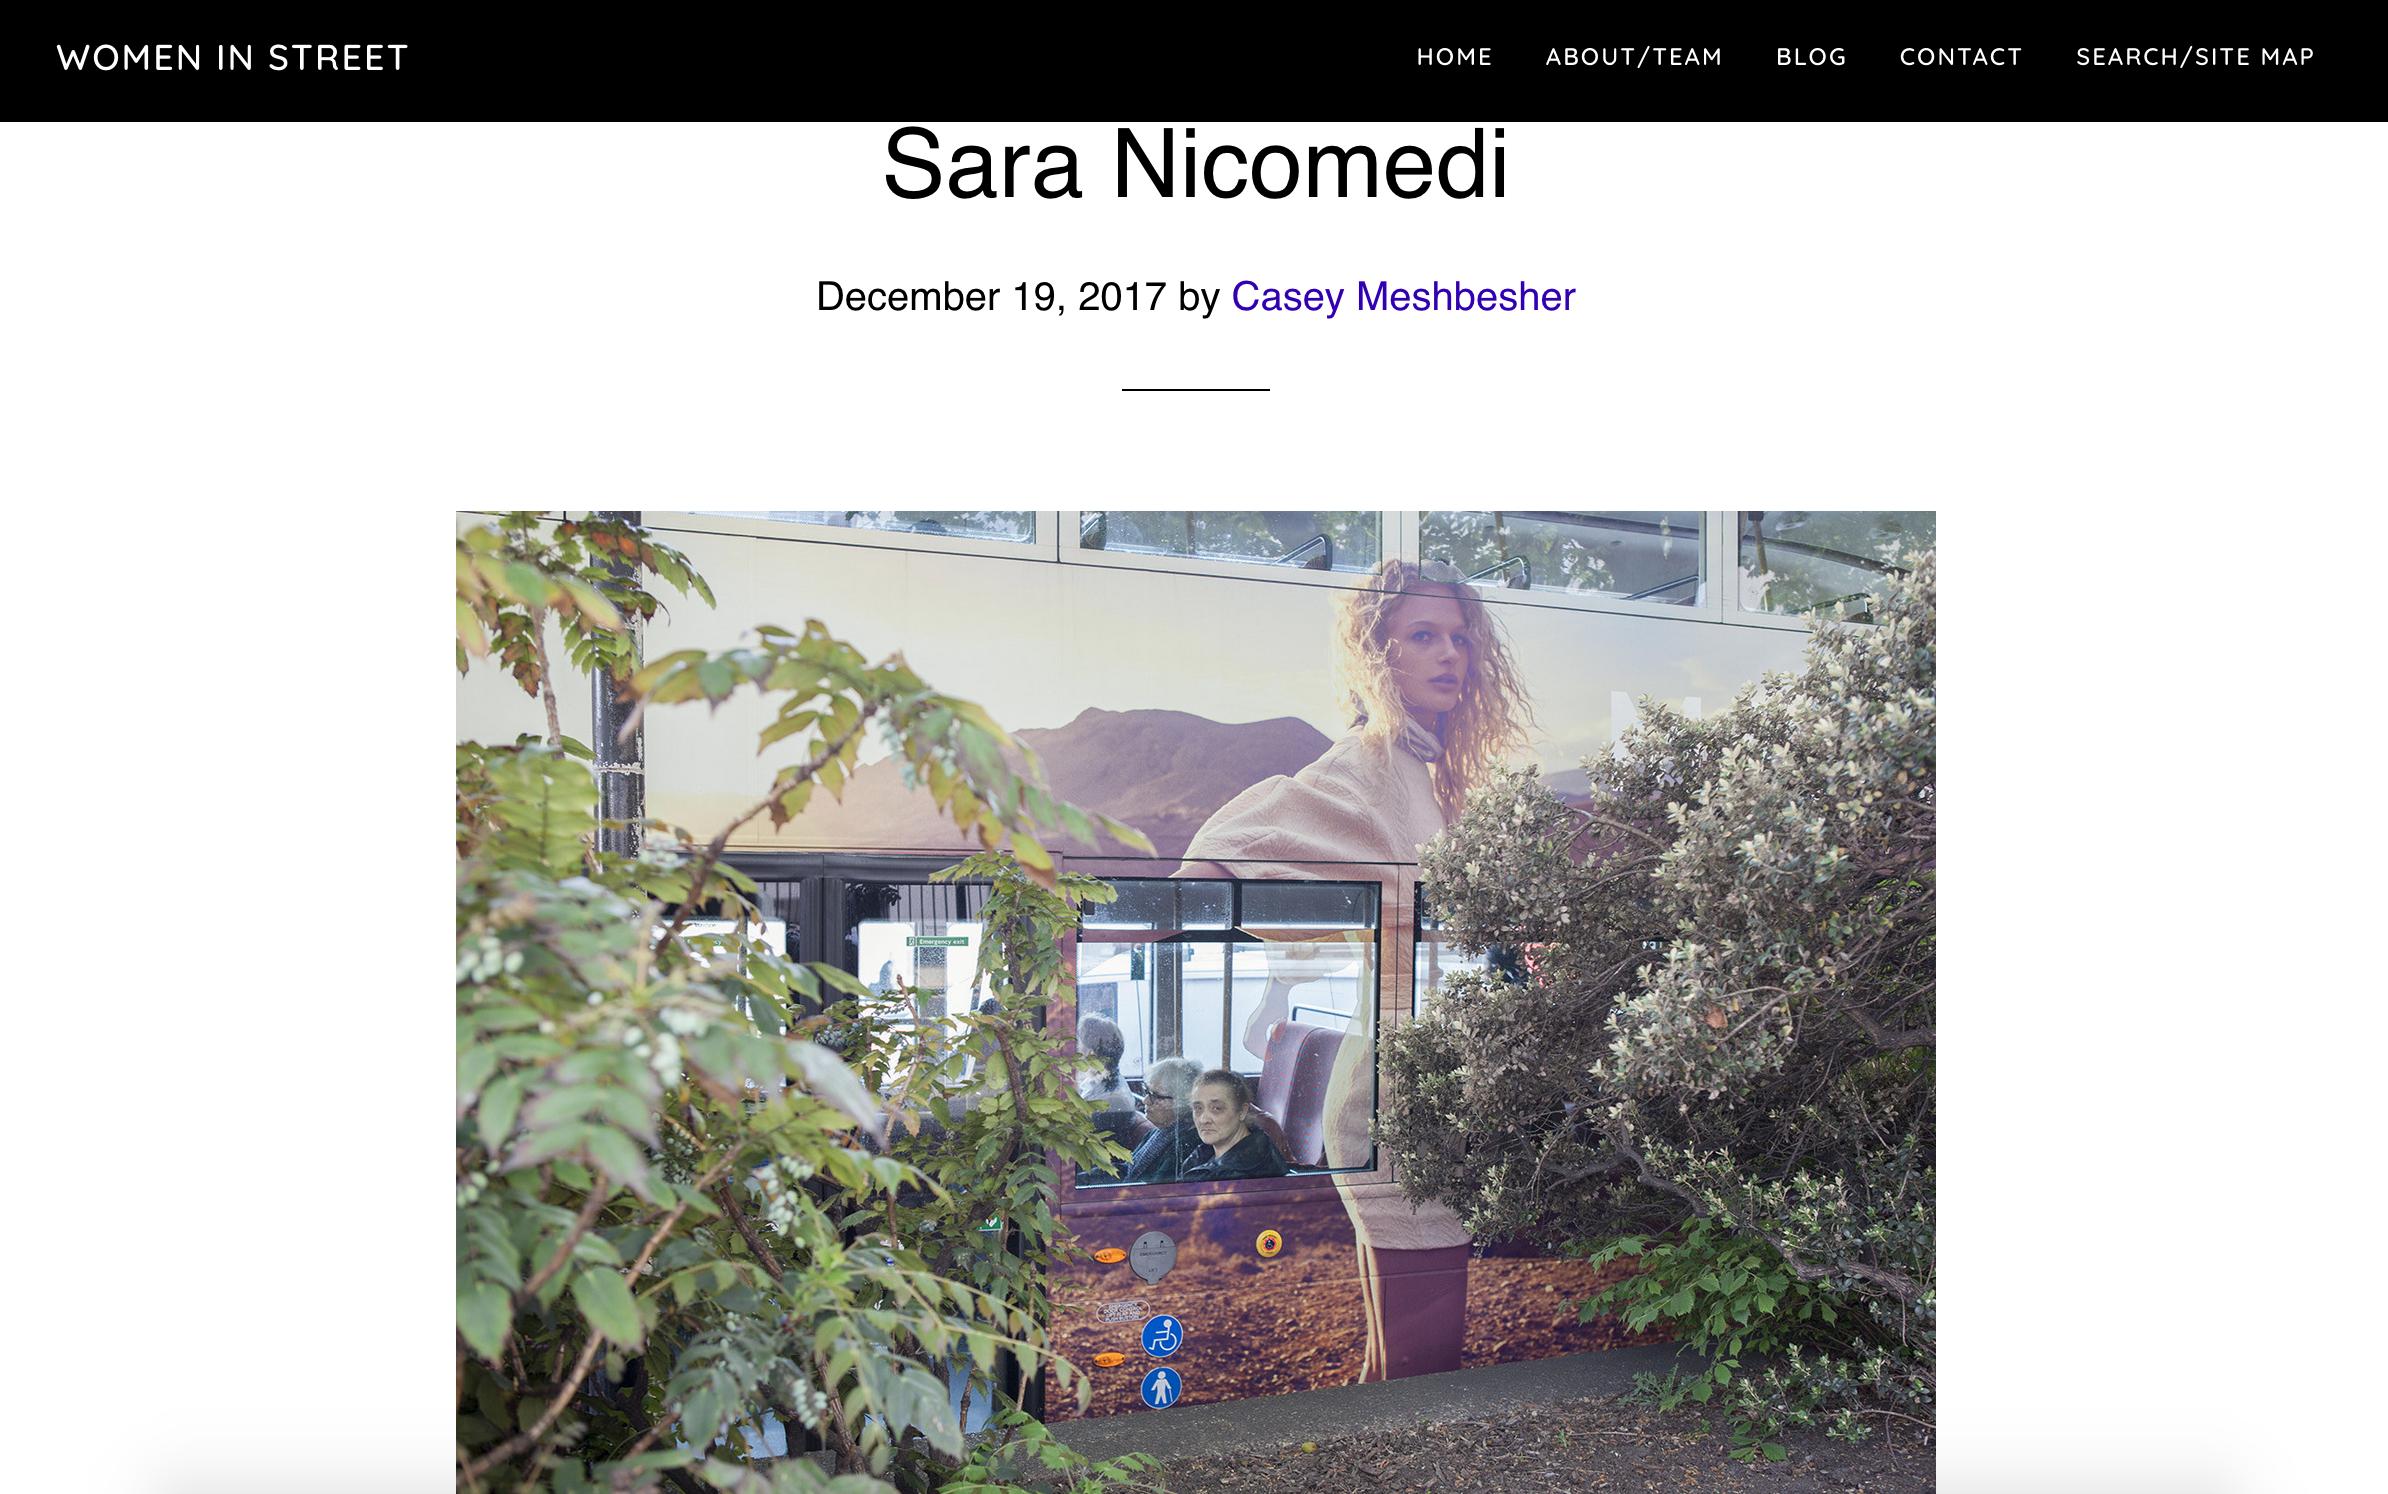 http://womeninstreet.com/2017/12/19/sara-nicomedi/